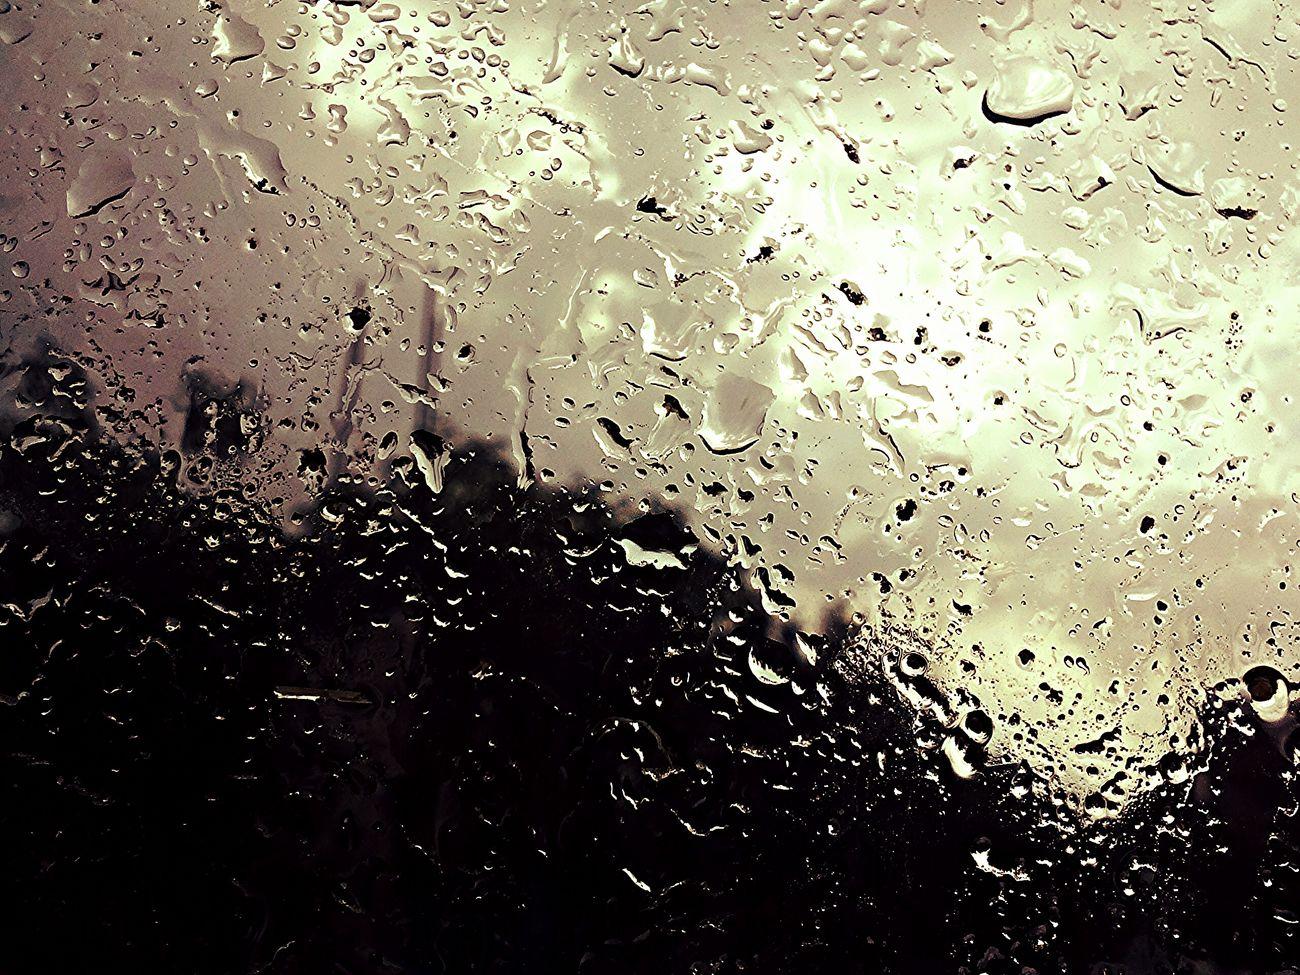 Rain Drops Quality Time Rain Silhouette